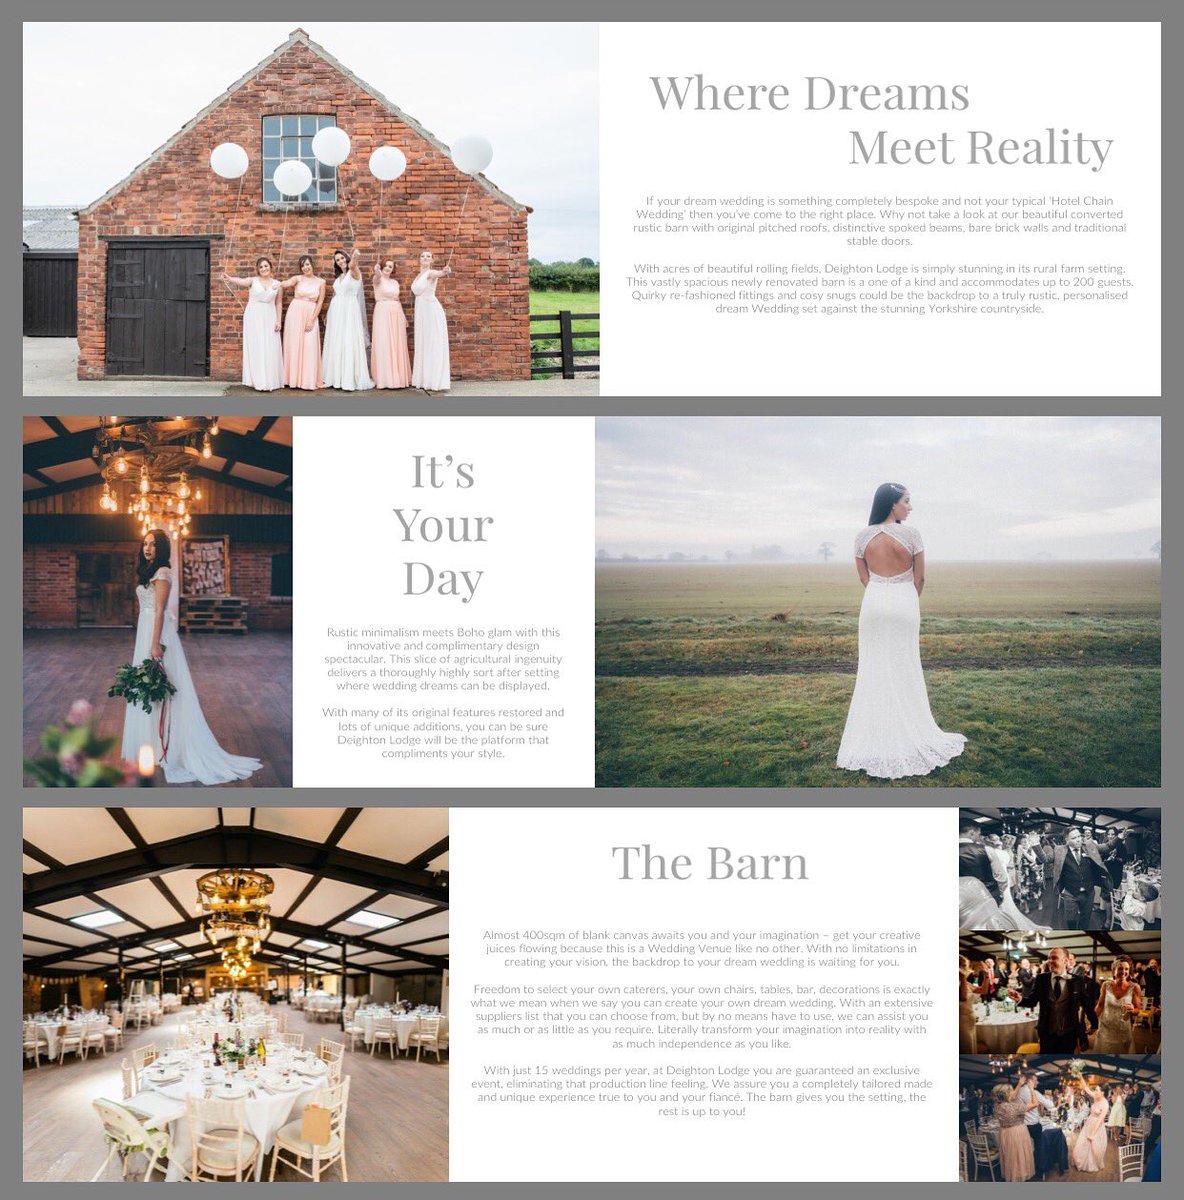 Deighton Lodge On Twitter B R O C H U E The Brochure Here Https T Co Whkssblkjk Wedding Farmwedding Barn